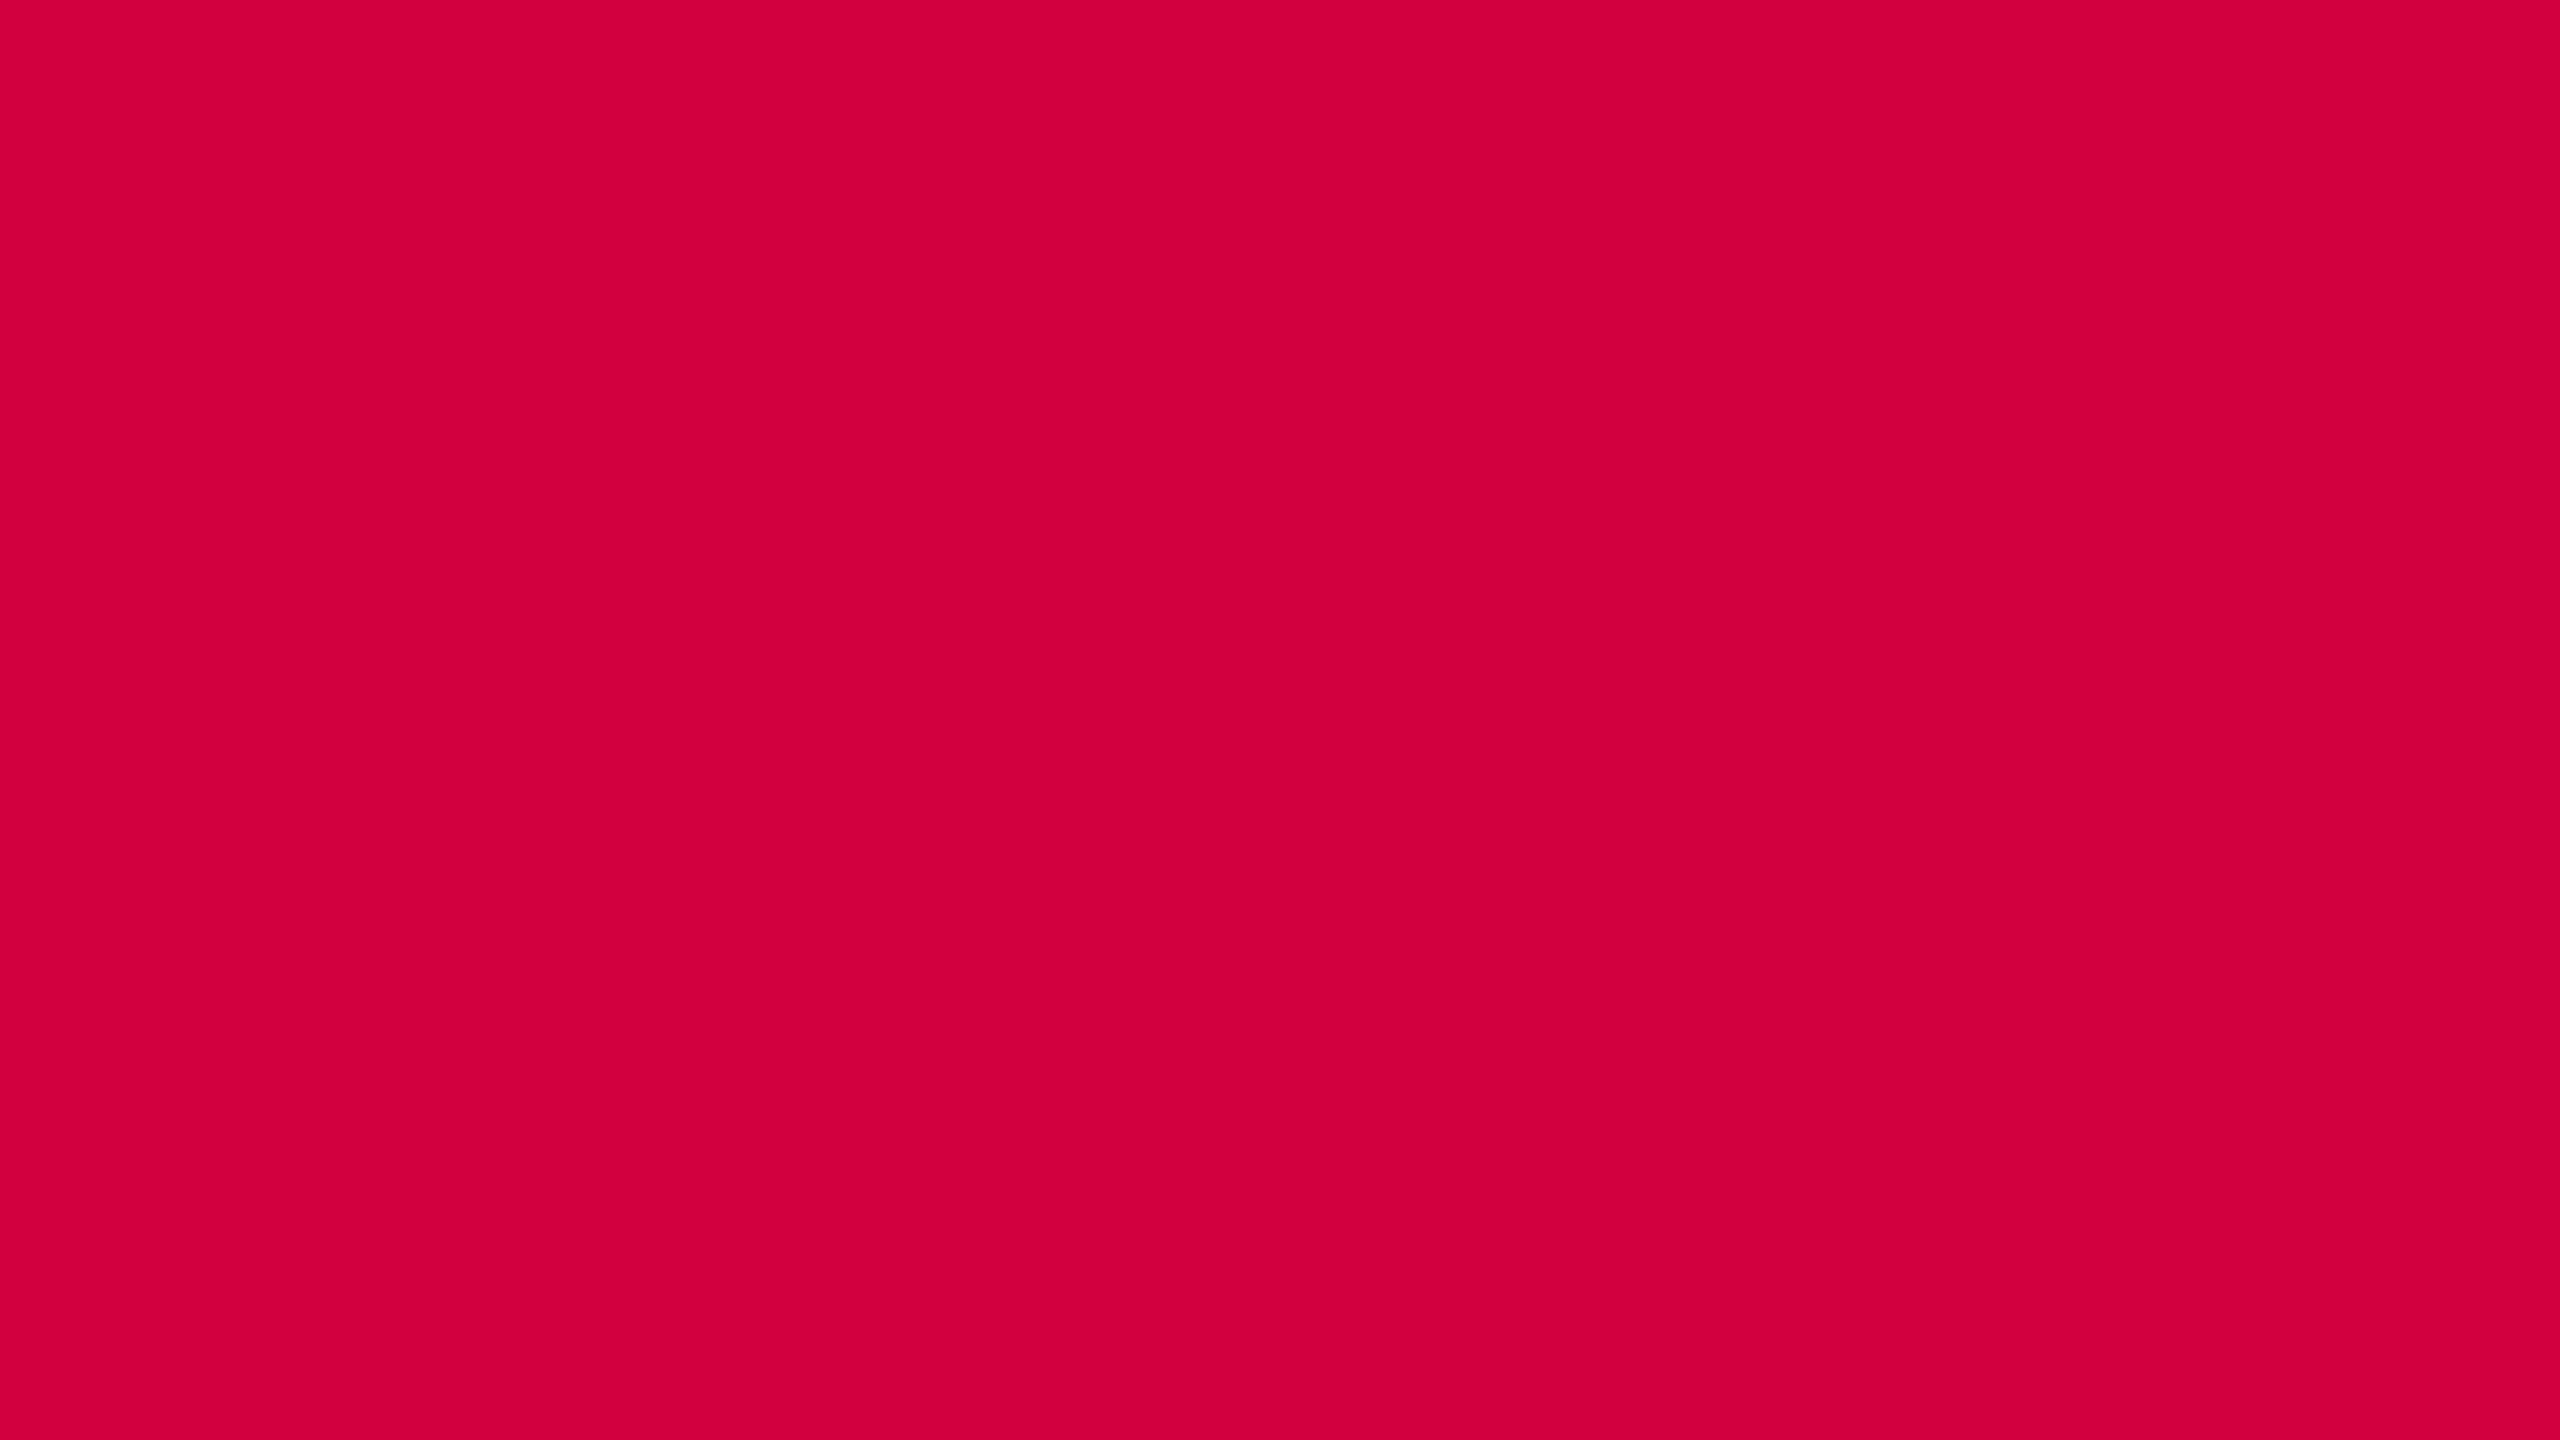 2560x1440 Utah Crimson Solid Color Background